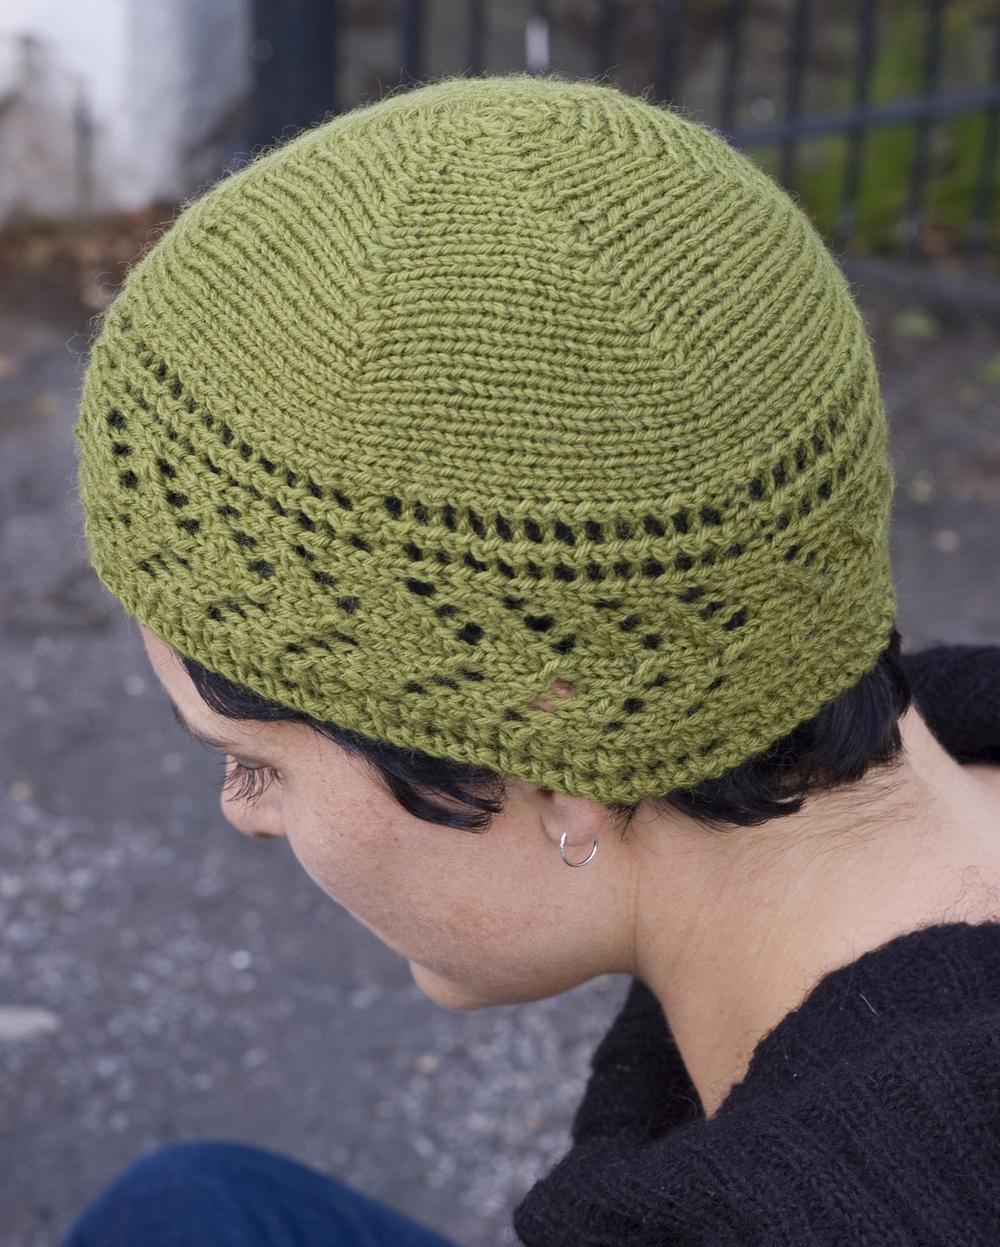 Dryad sideways knit summer lace beanie pattern